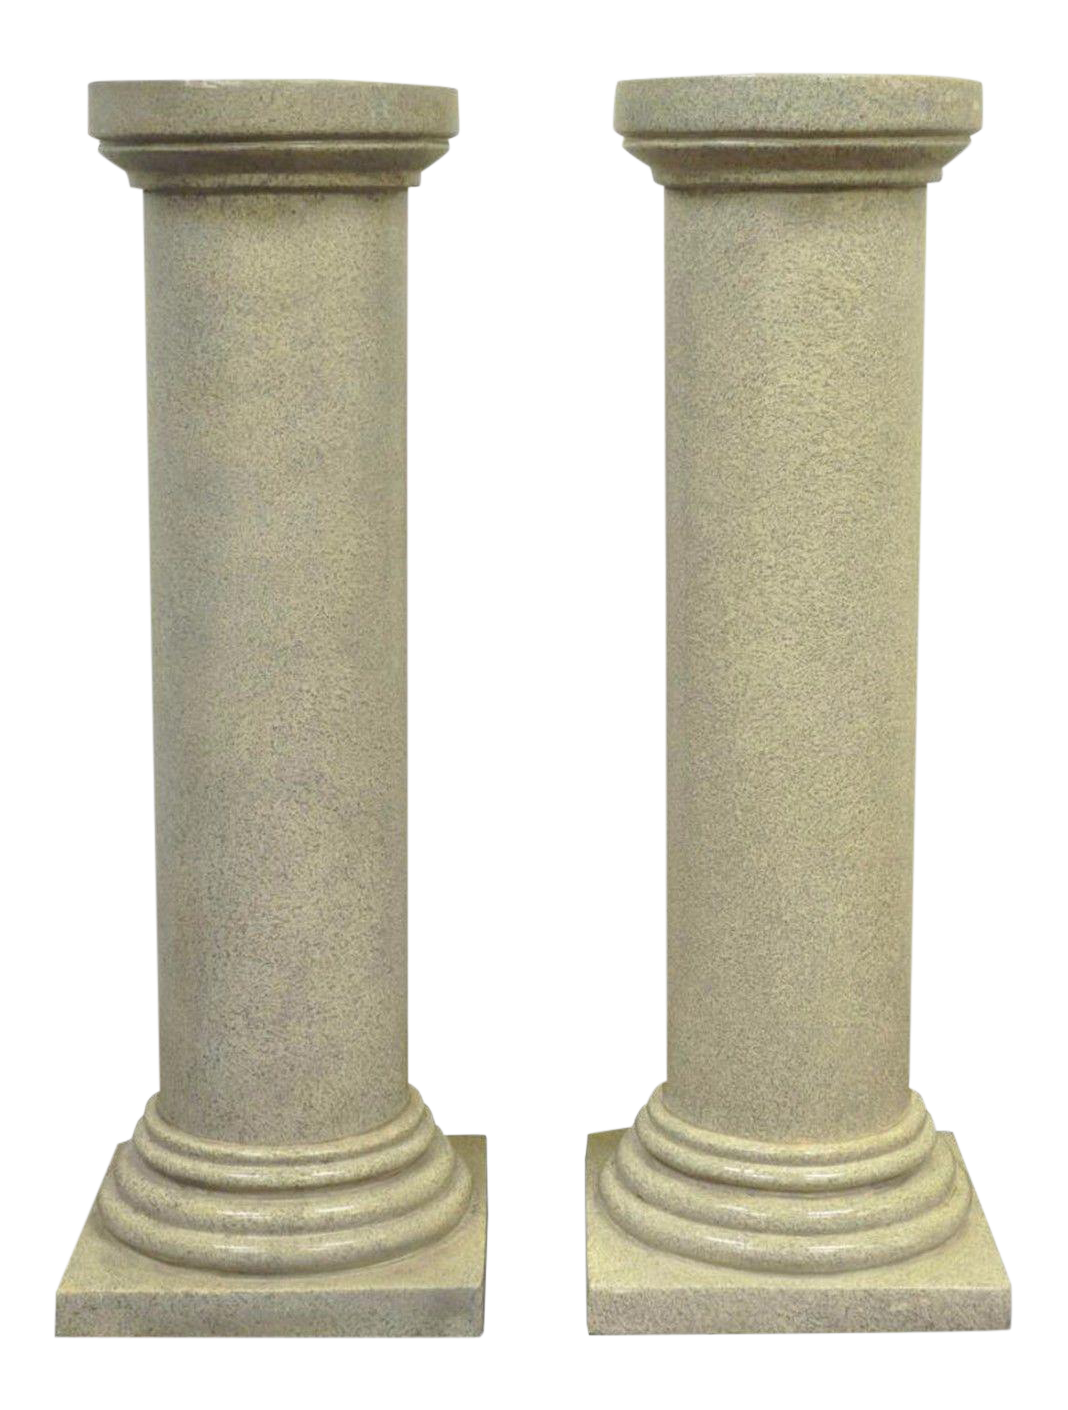 Pair Of 40 Faux Concrete Fiberglass Column Pedestals Sculpture Plant Stand Vintage Fiberglass Columns Pillar Design Wooden Columns